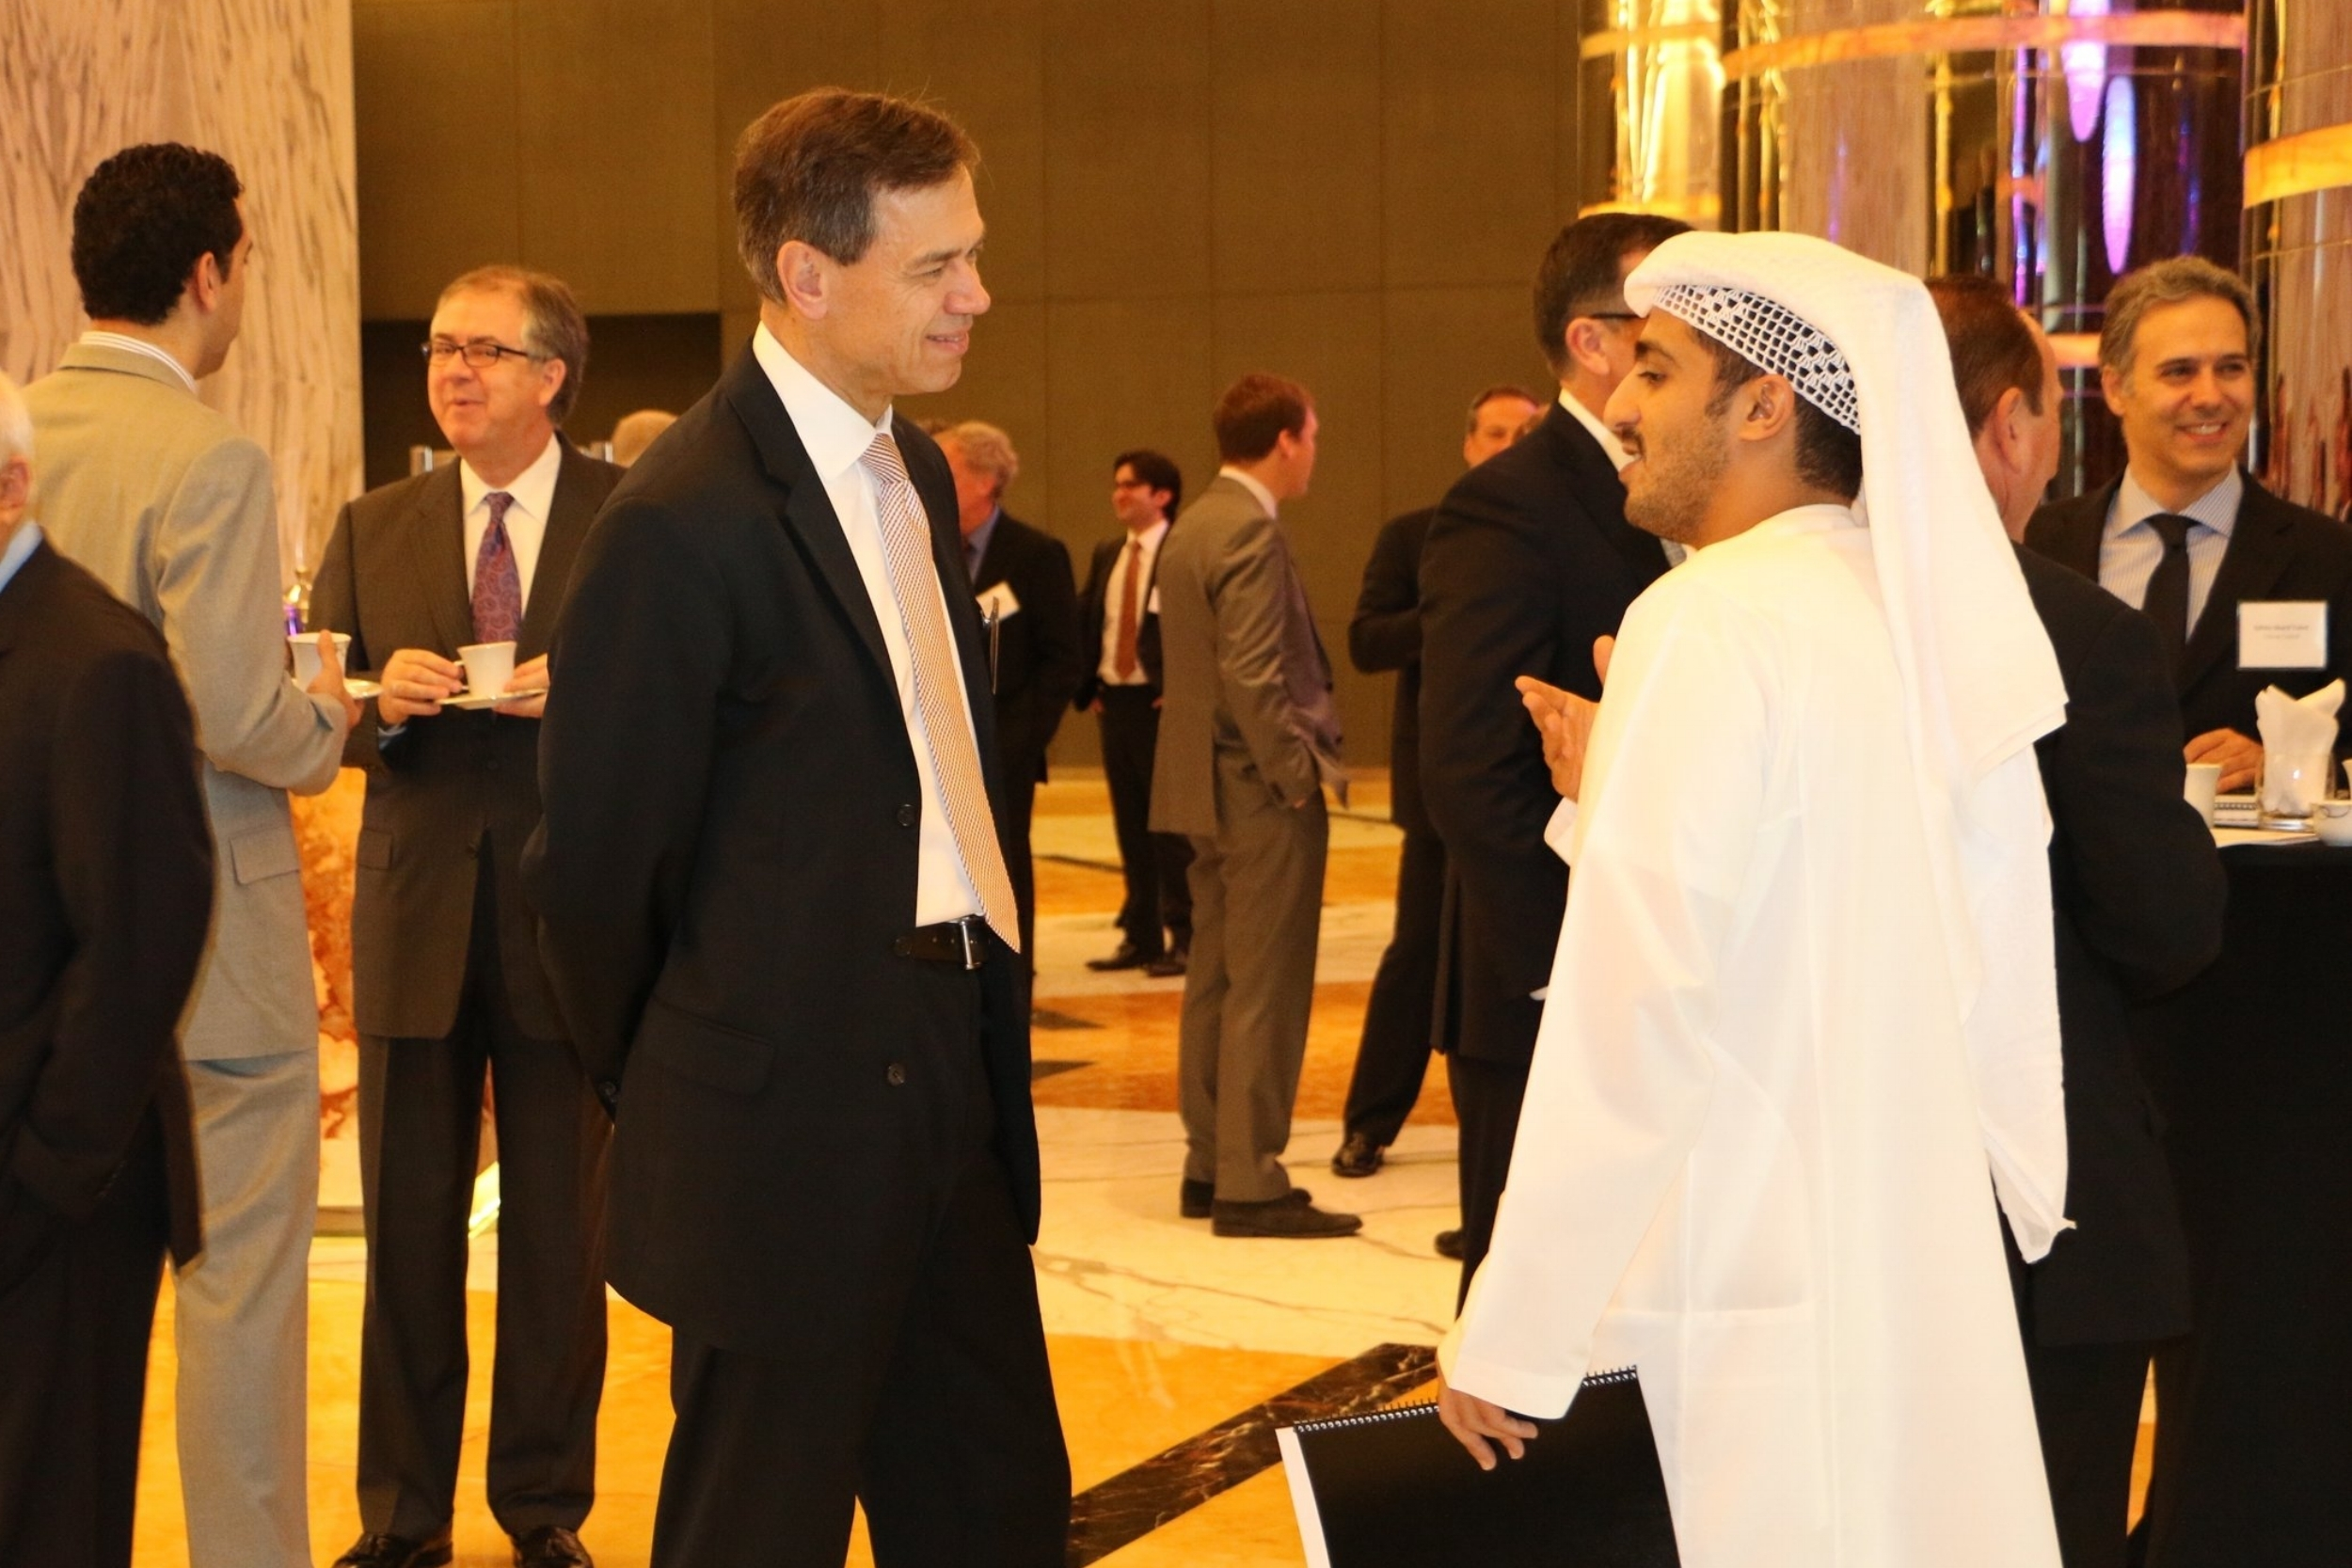 Embassy Staff Mingle & Make Introductions in Abu Dhabi